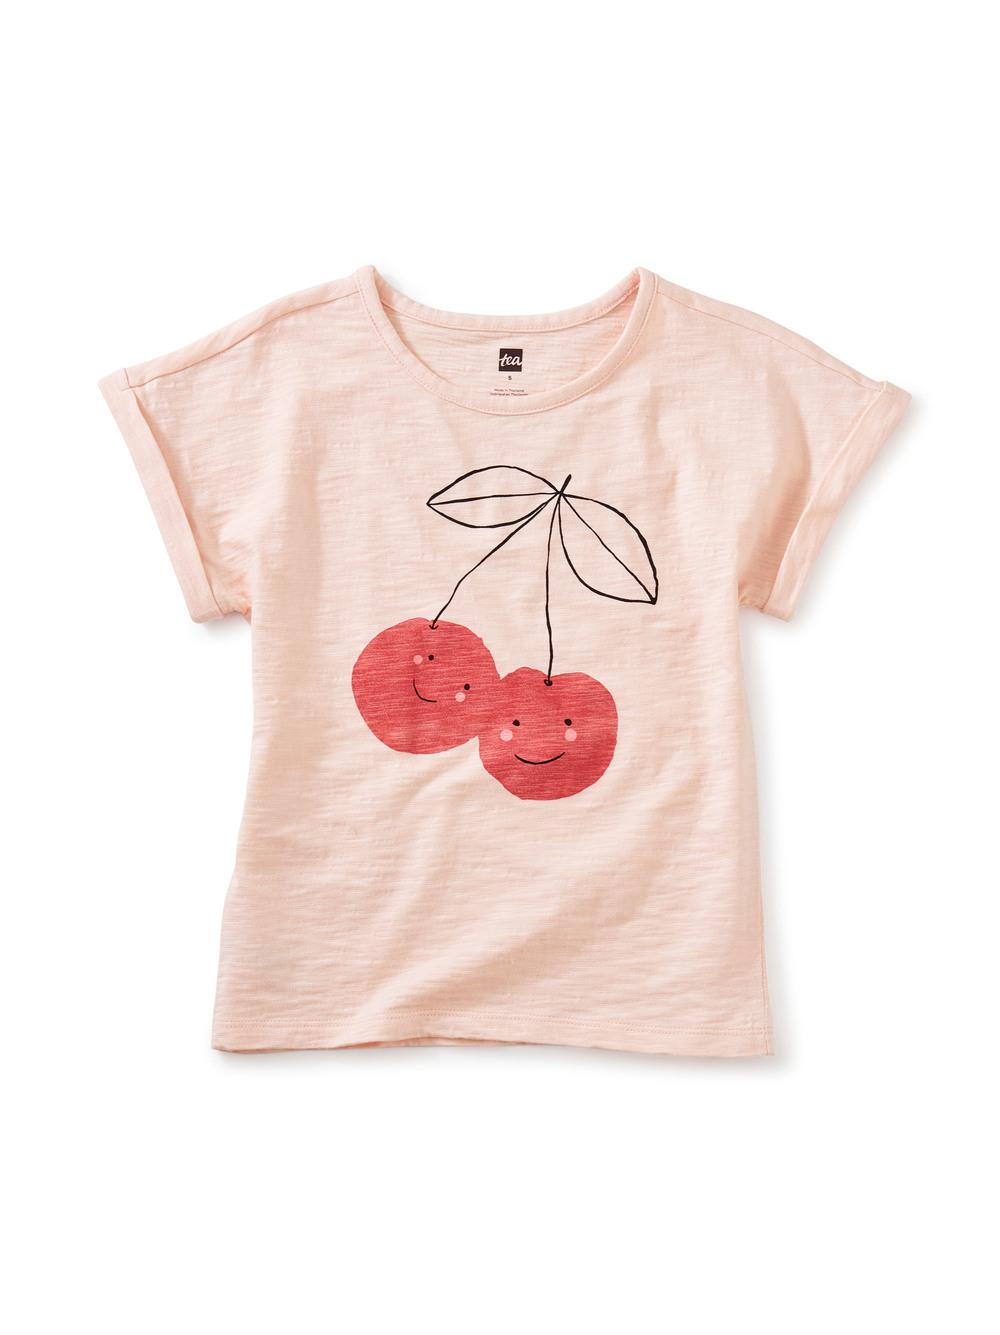 So Very Cherry Graphic Tee